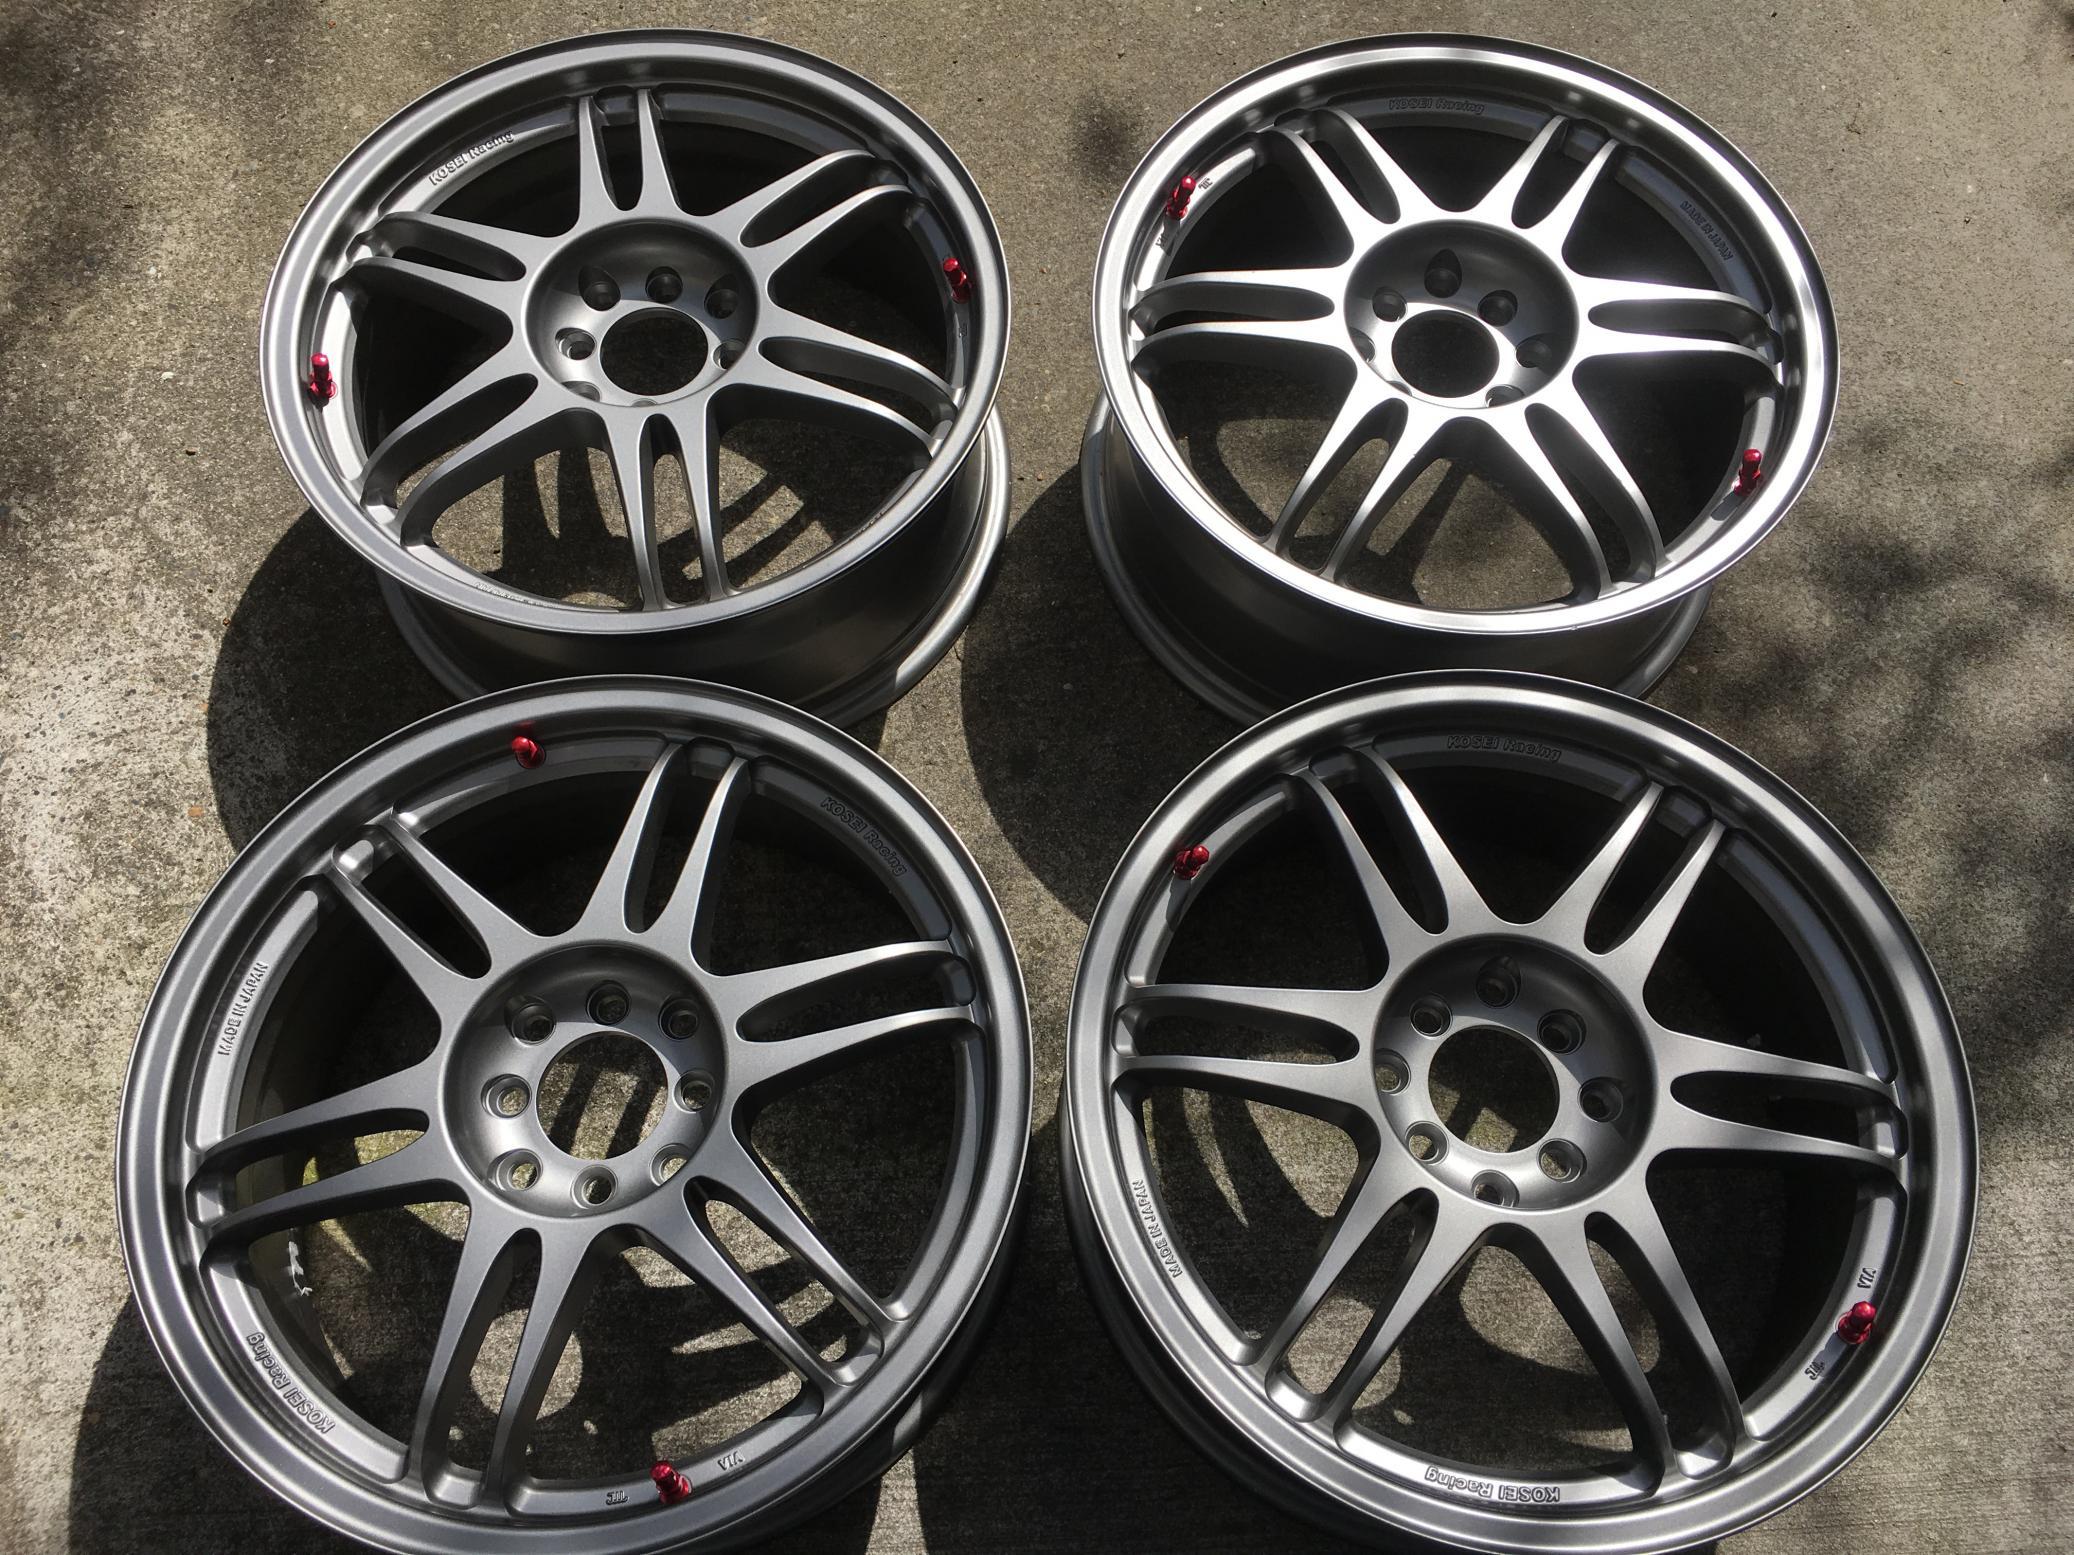 [For Sale] New 17x7 Kosei K1-TS Racing Wheels - 4x100 ...